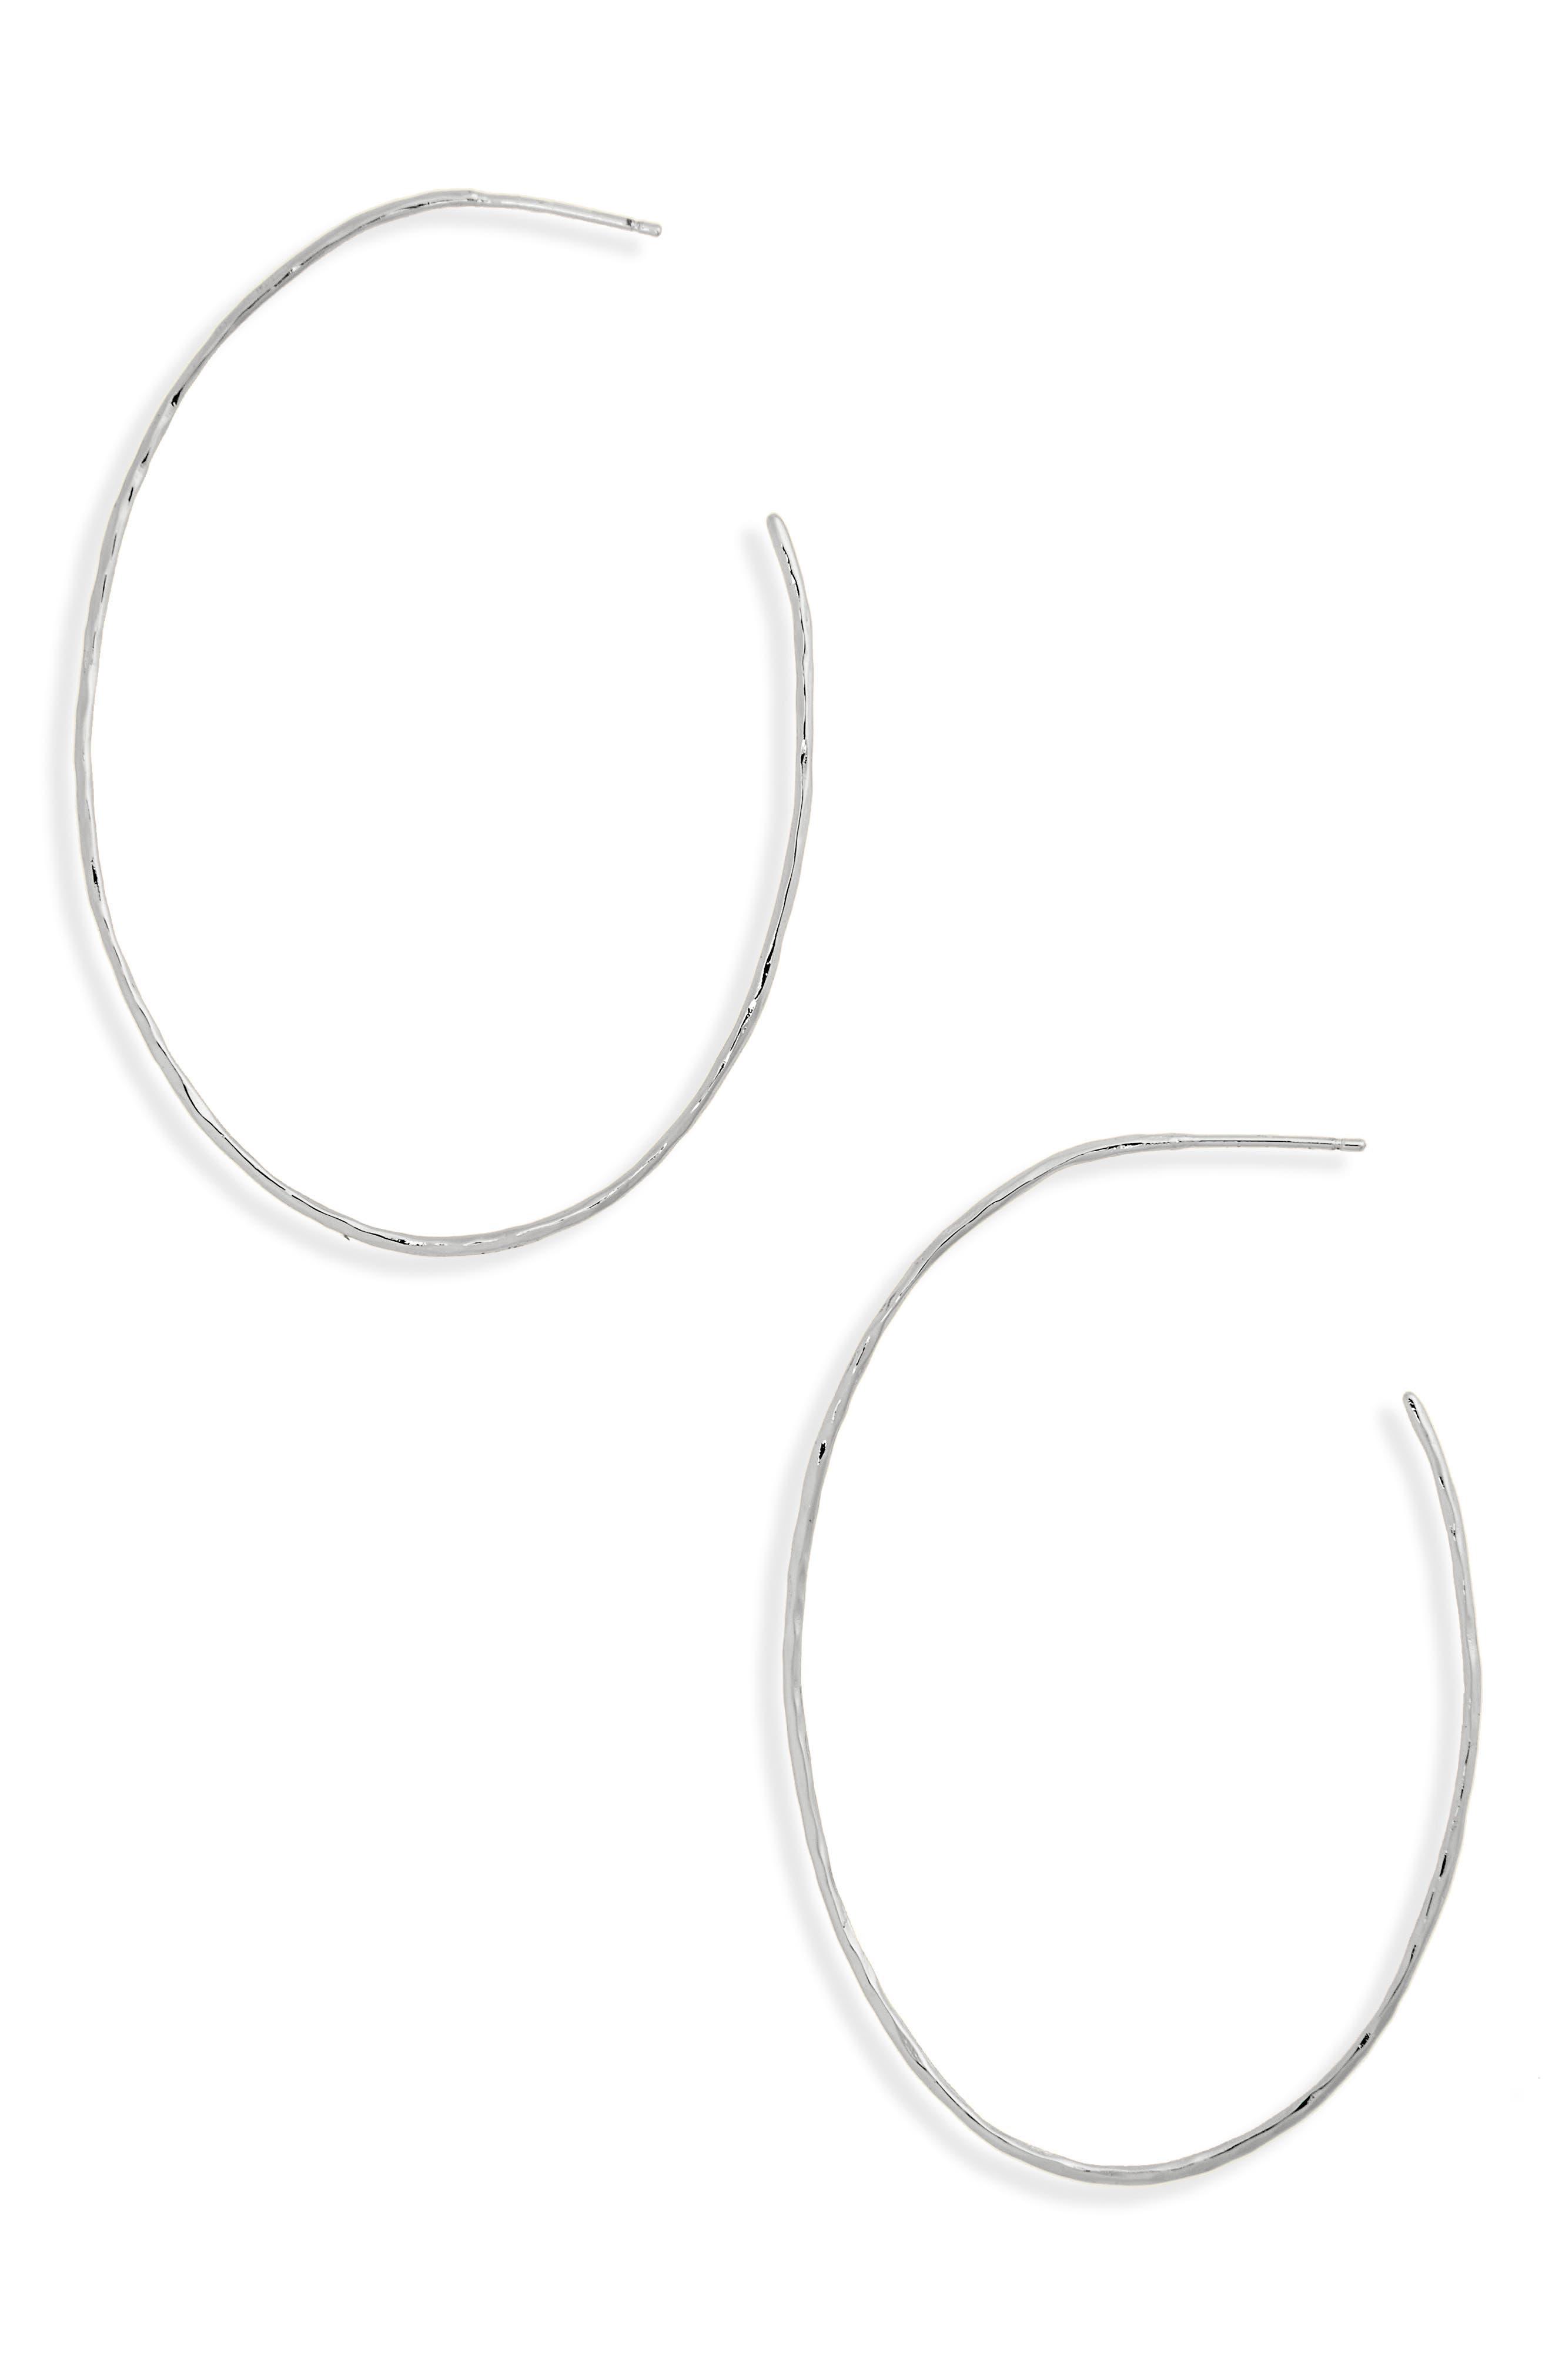 Summer Oval Hoop Earrings,                             Main thumbnail 1, color,                             SILVER